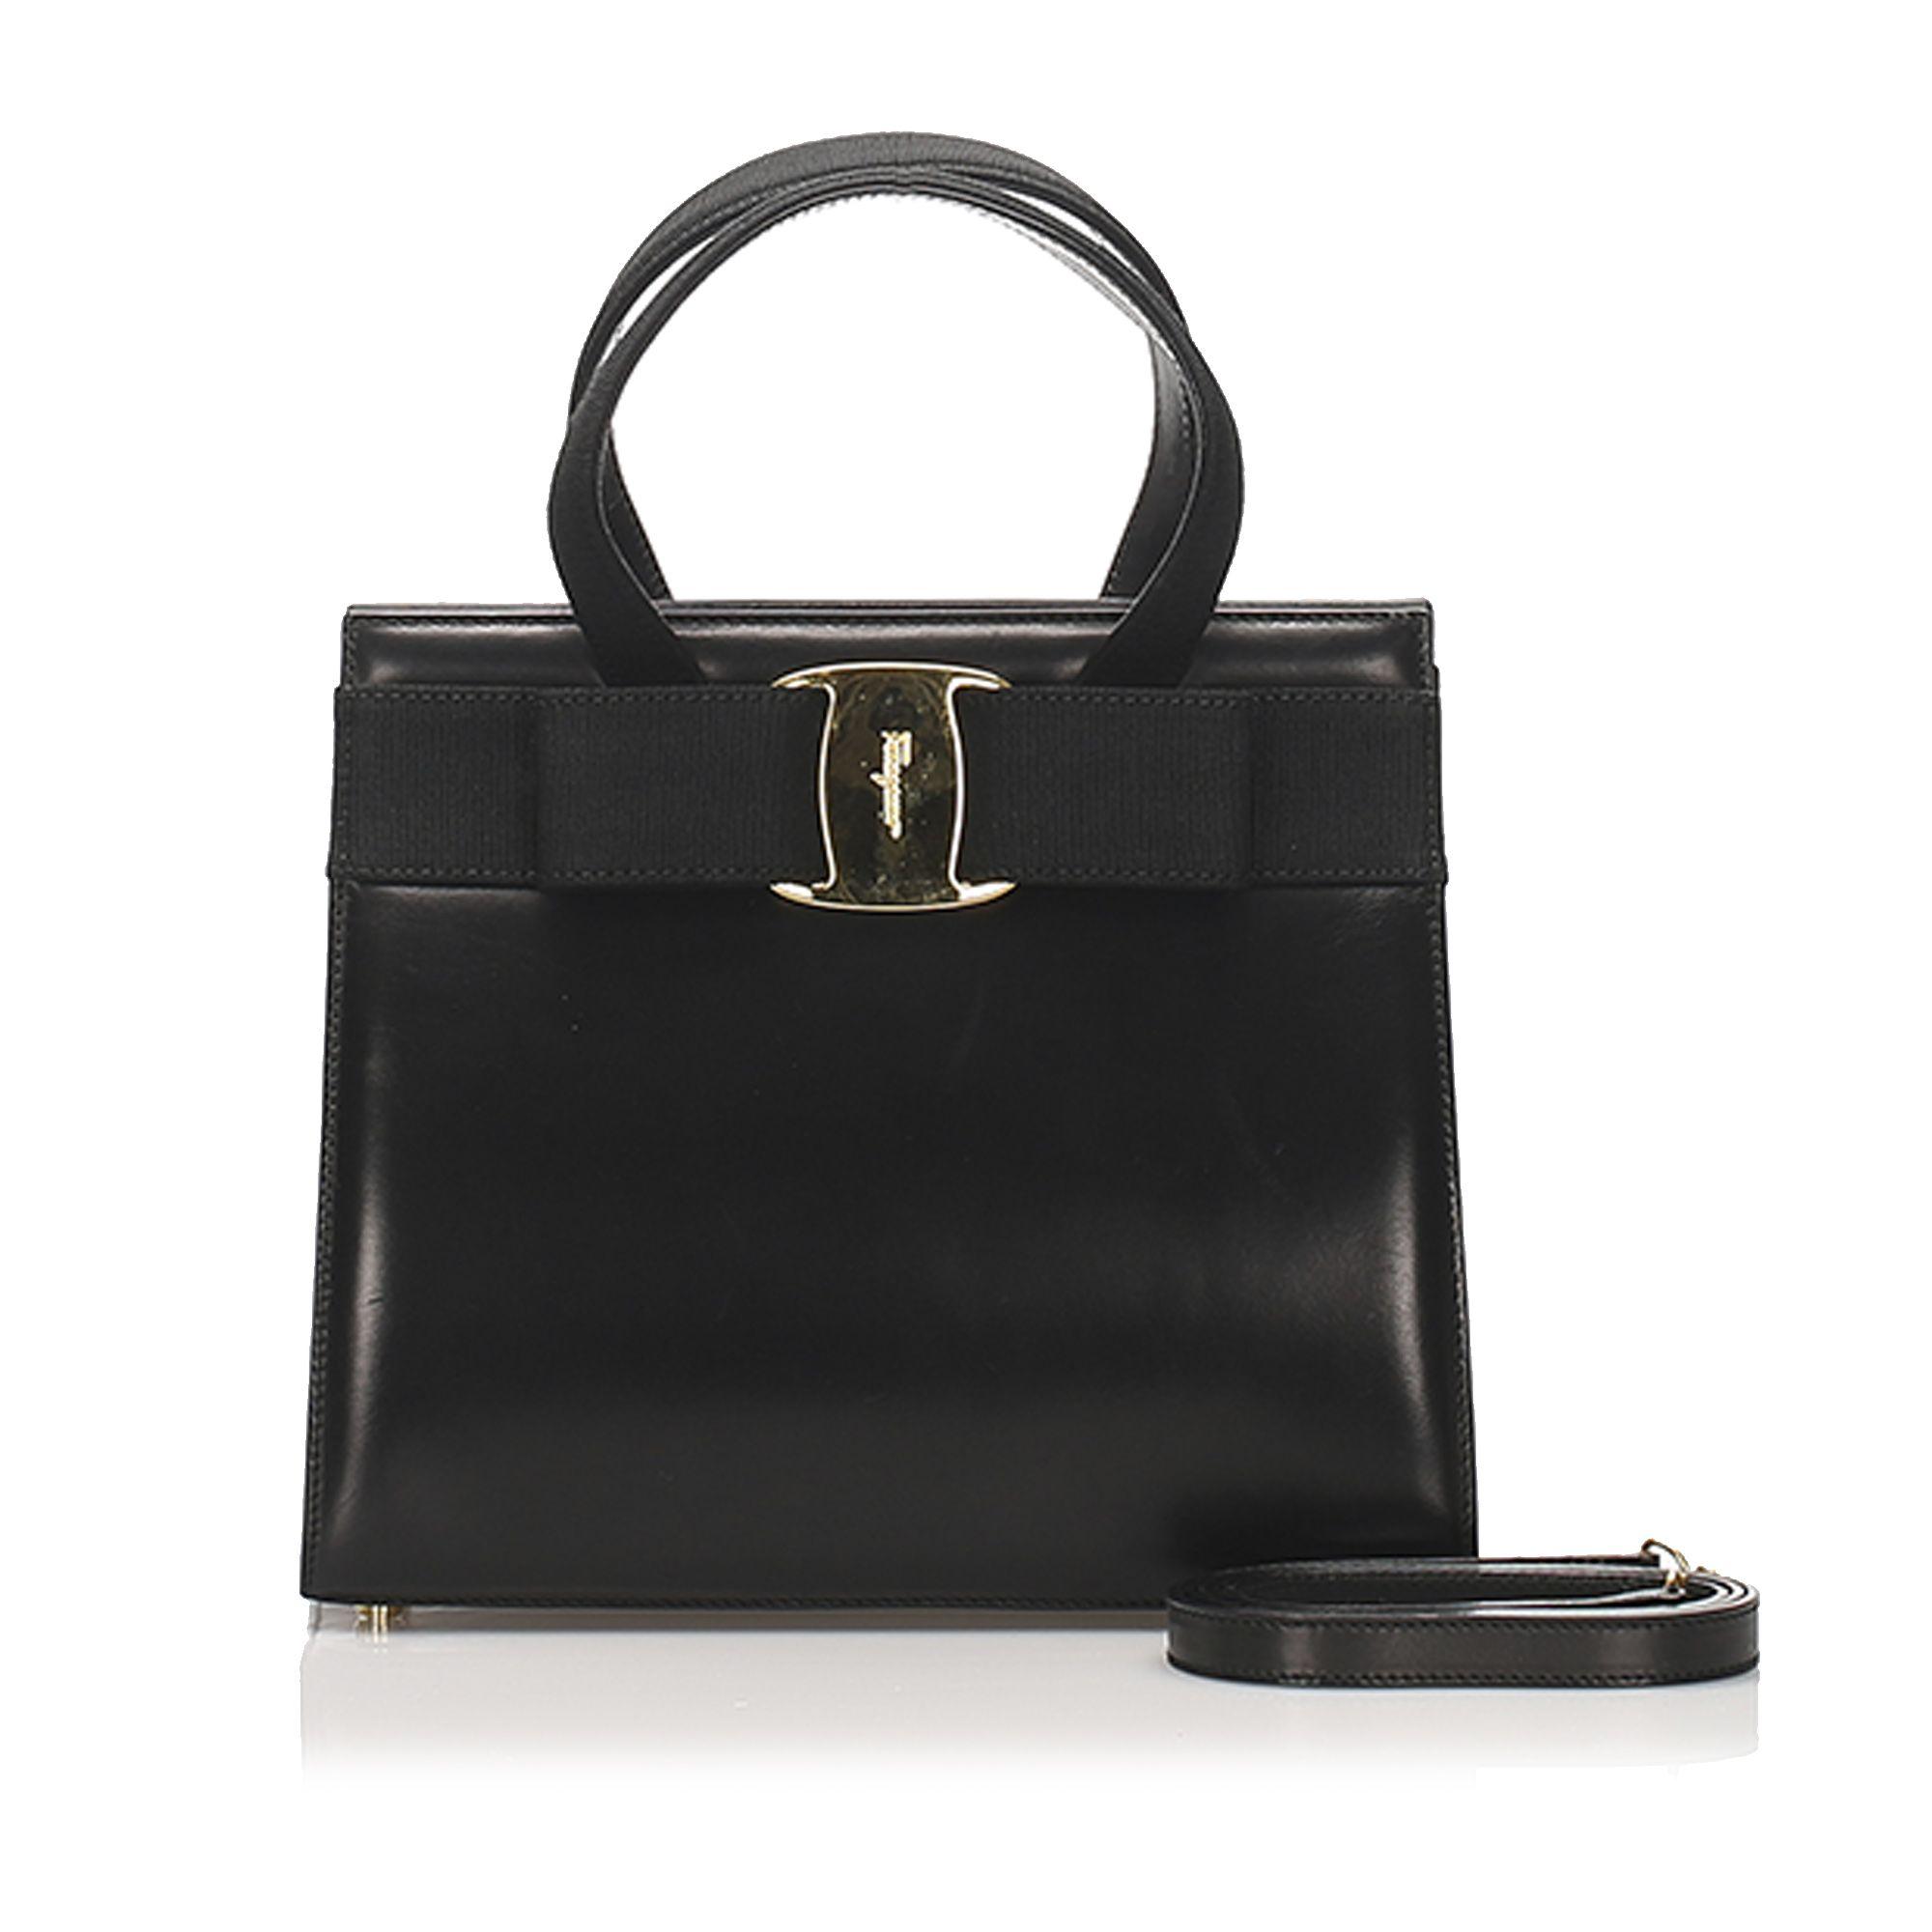 Vintage Ferragamo Vara Leather Satchel Black